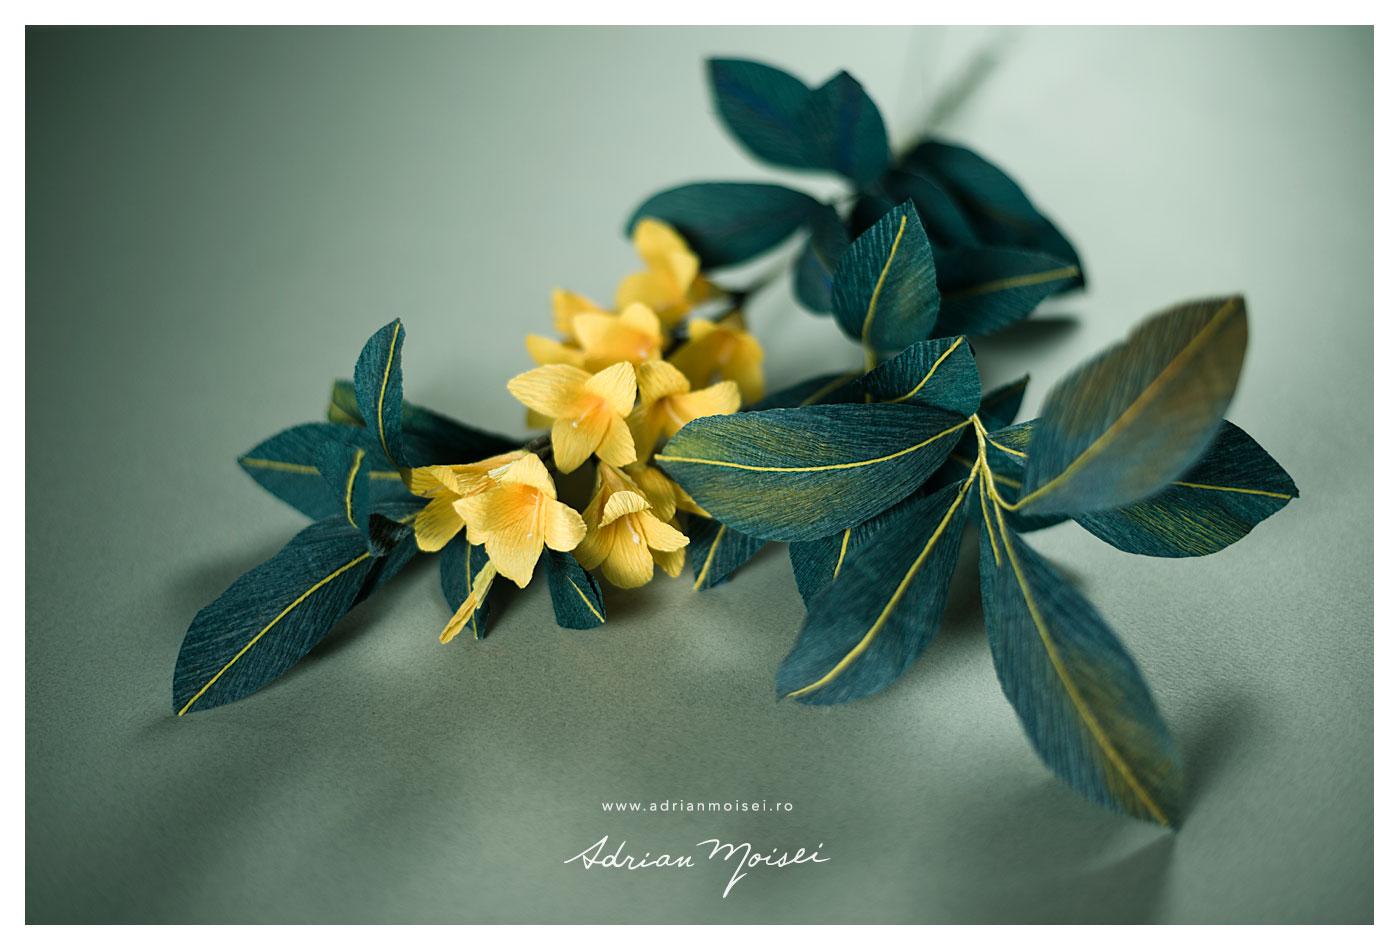 Fotografie de produs Iasi - flori de hartie - fotograf Iasi Adrian Moisei